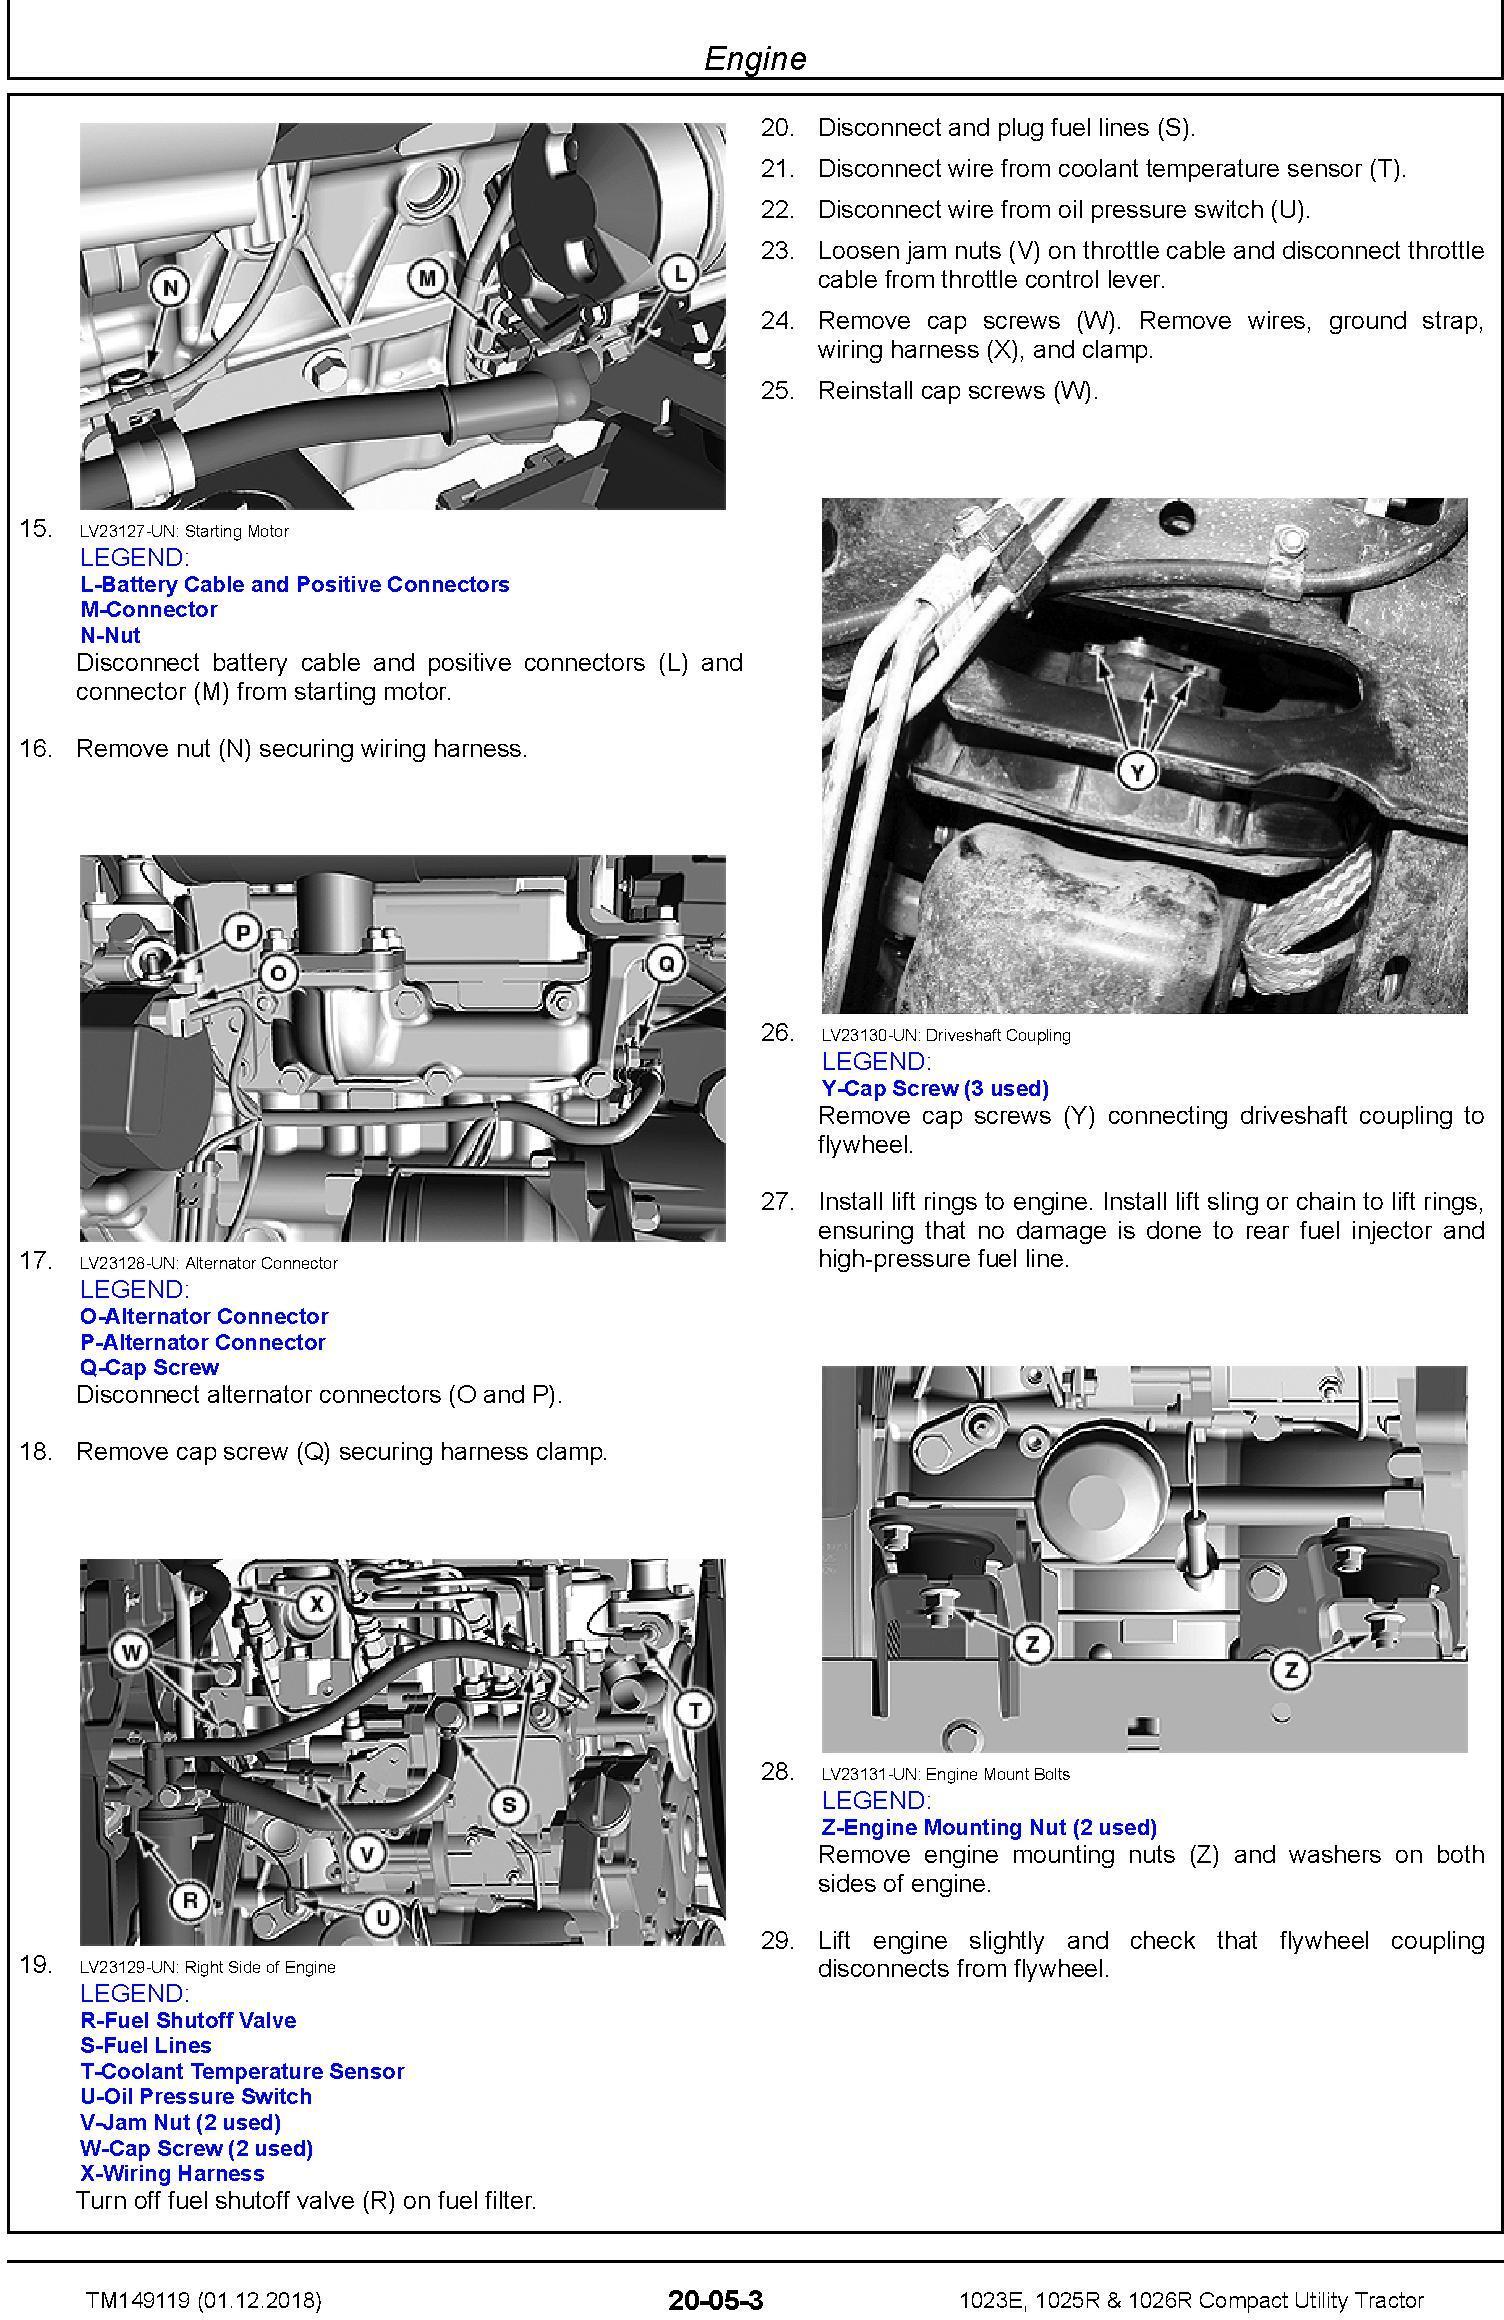 John Deere 1023E, 1025R, 1026R Compact Utility Tractor (SN. HJ0100001- ) Technical Manual (TM149119) - 1